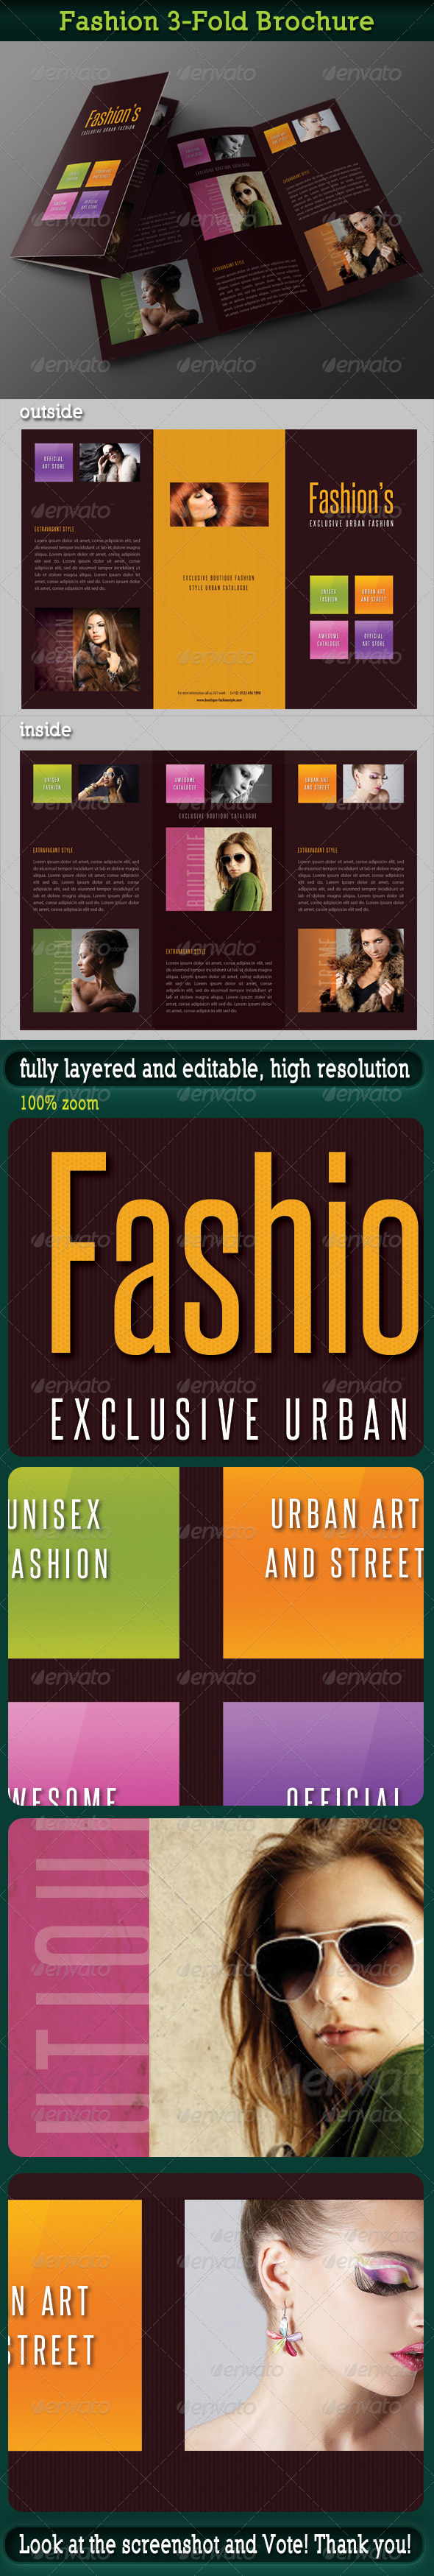 Fashion 3-Fold Brochure 18 - Portfolio Brochures